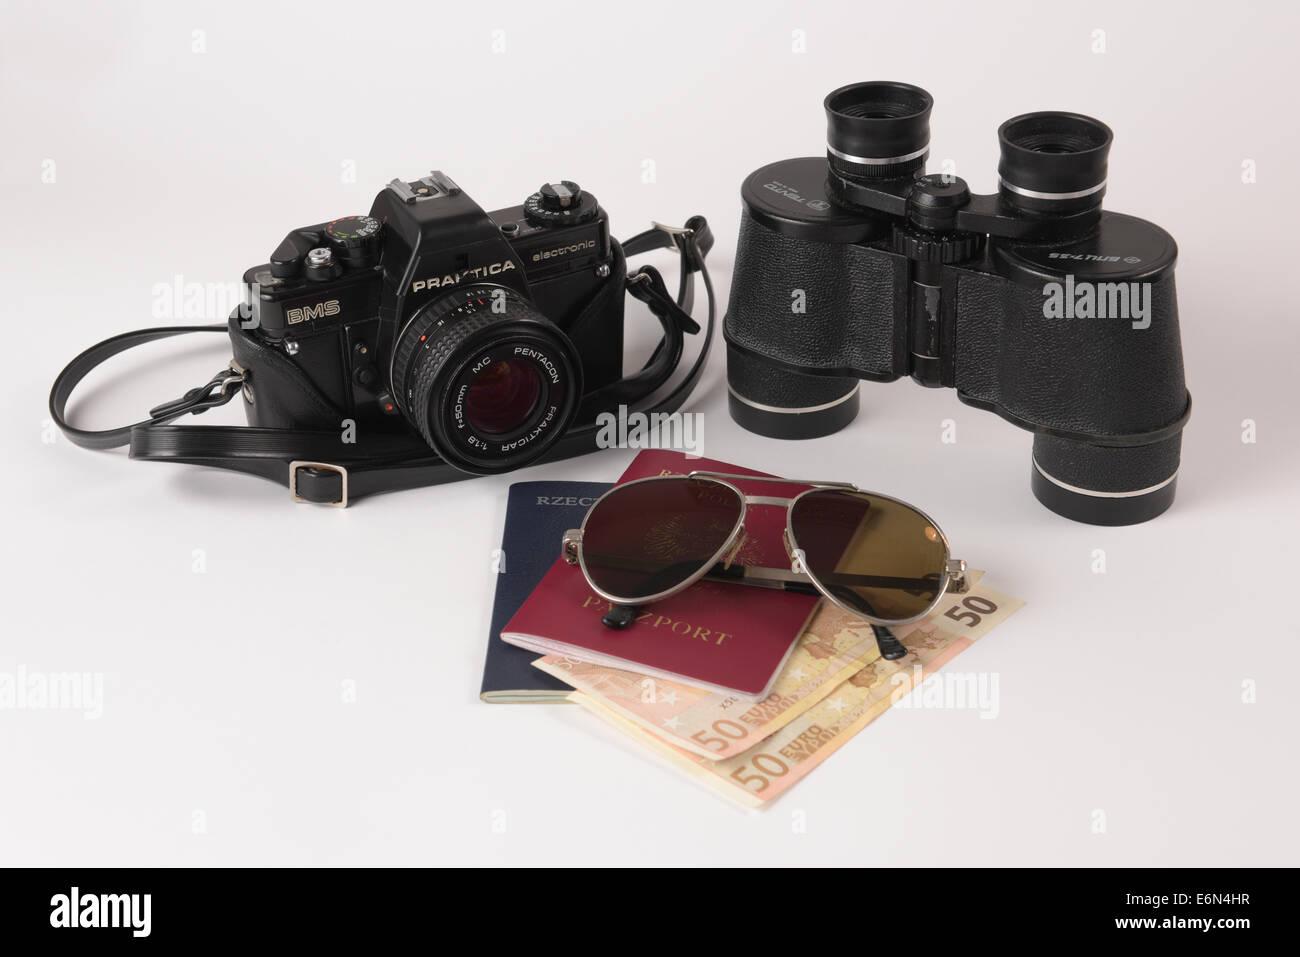 Old analog camera, binocular, sunglasses and passports with some money. Stock Photo